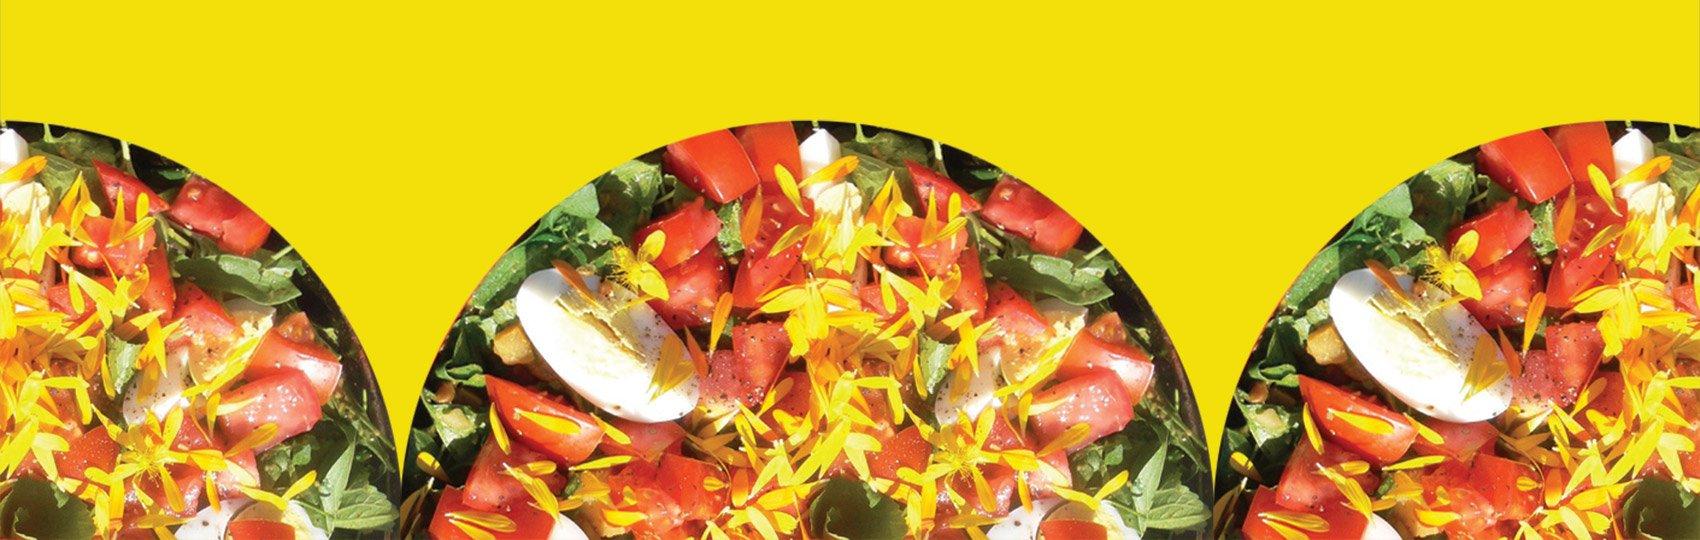 Mujaji - Salad of the Encumbent